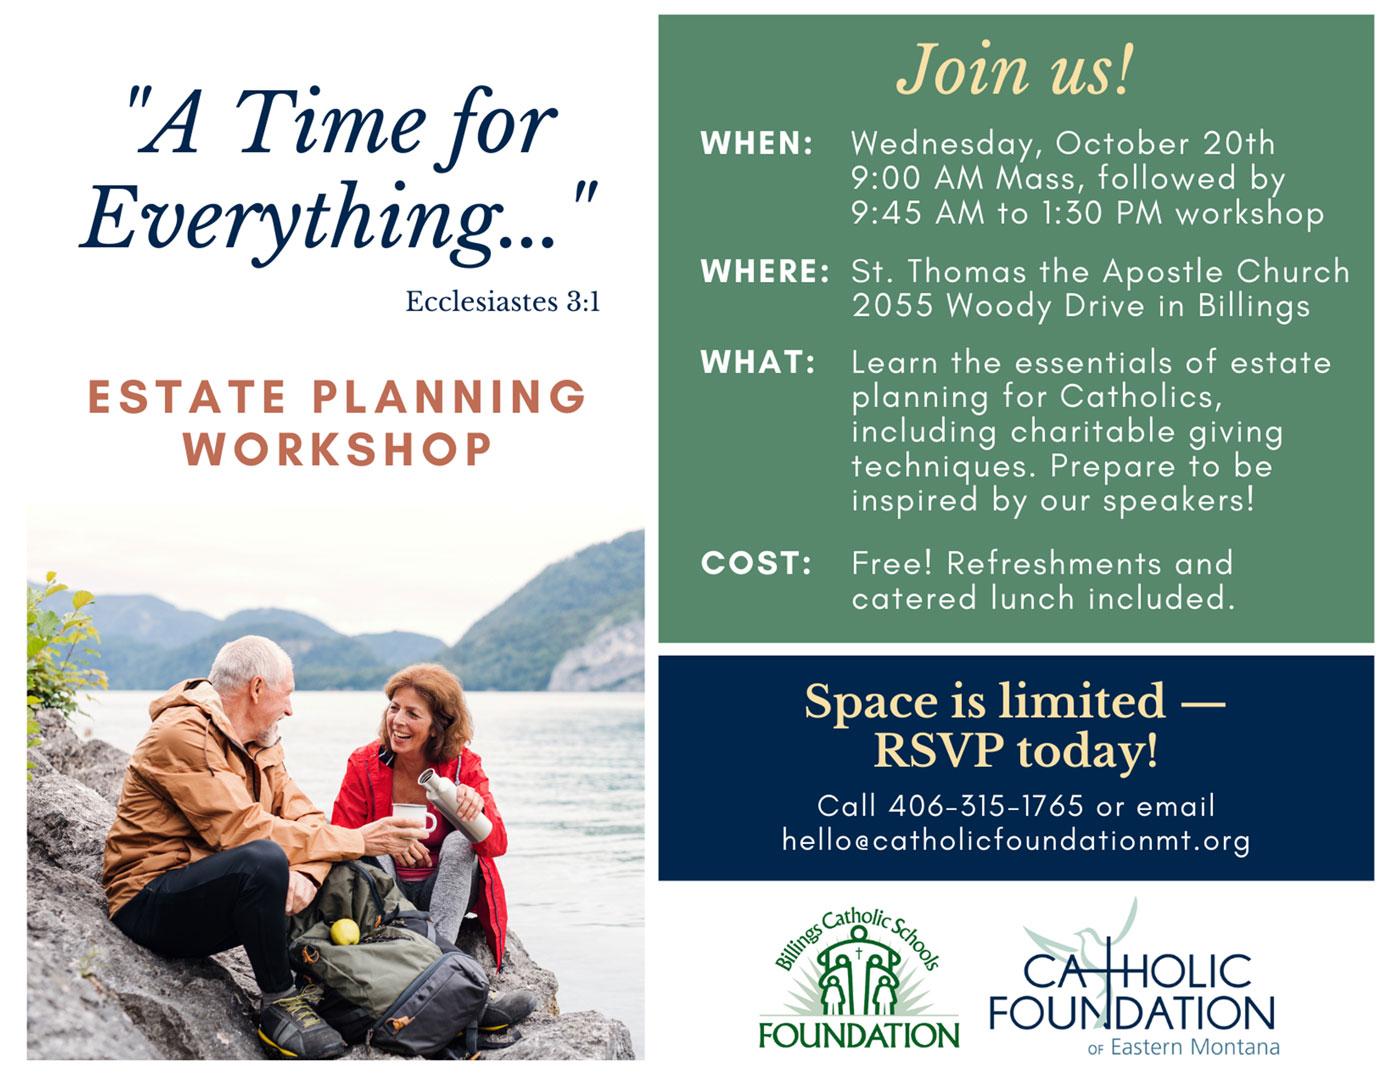 Estate Planning Workshop in Billings 10/20/21